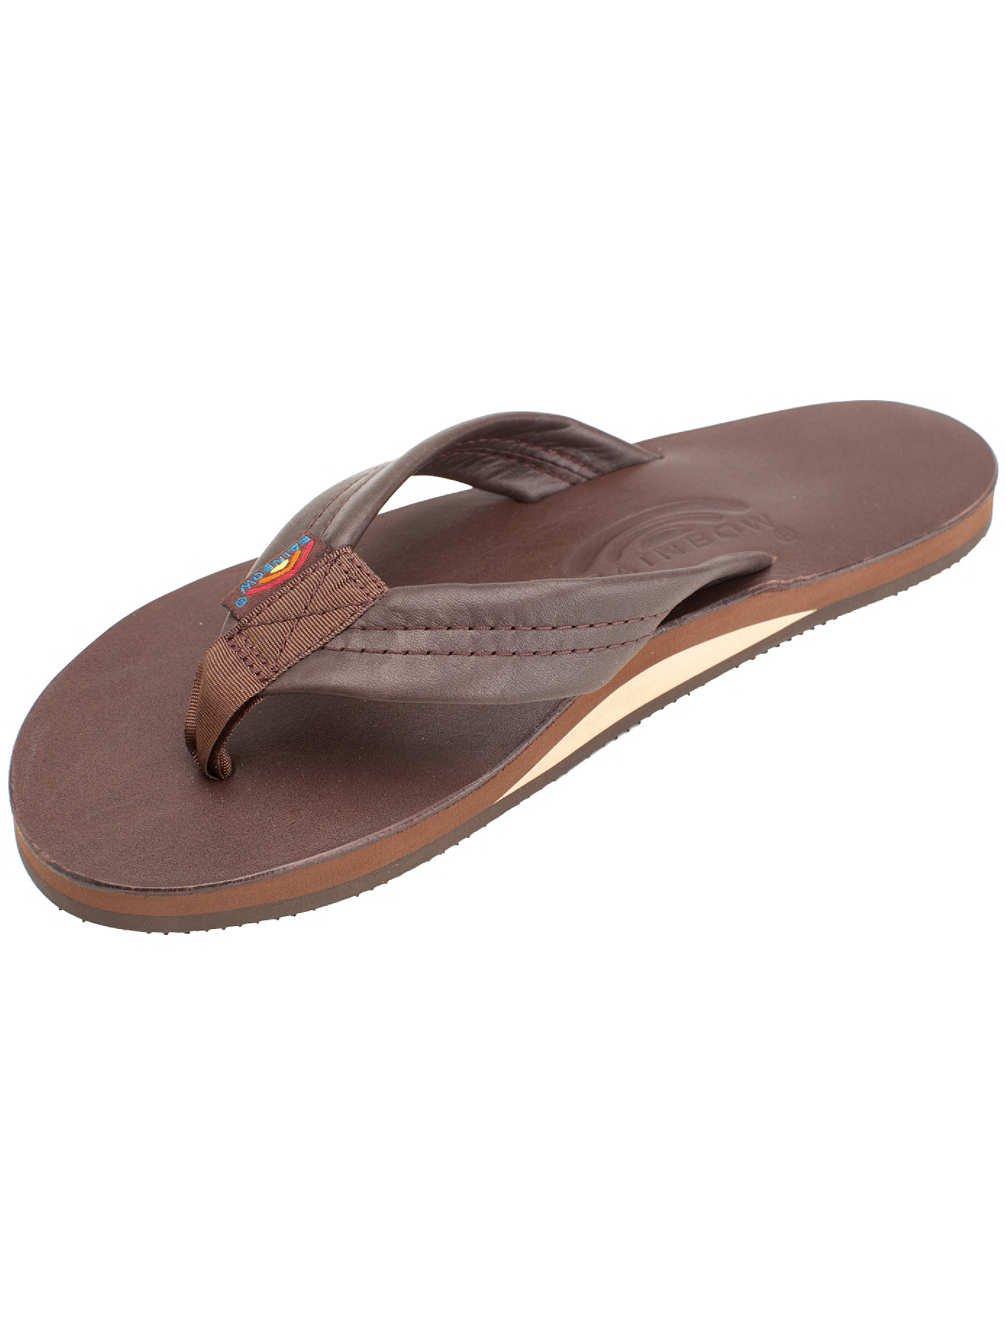 a04e38a7a74b Galleon - Rainbow Sandals Men s Premier Leather Single Layer